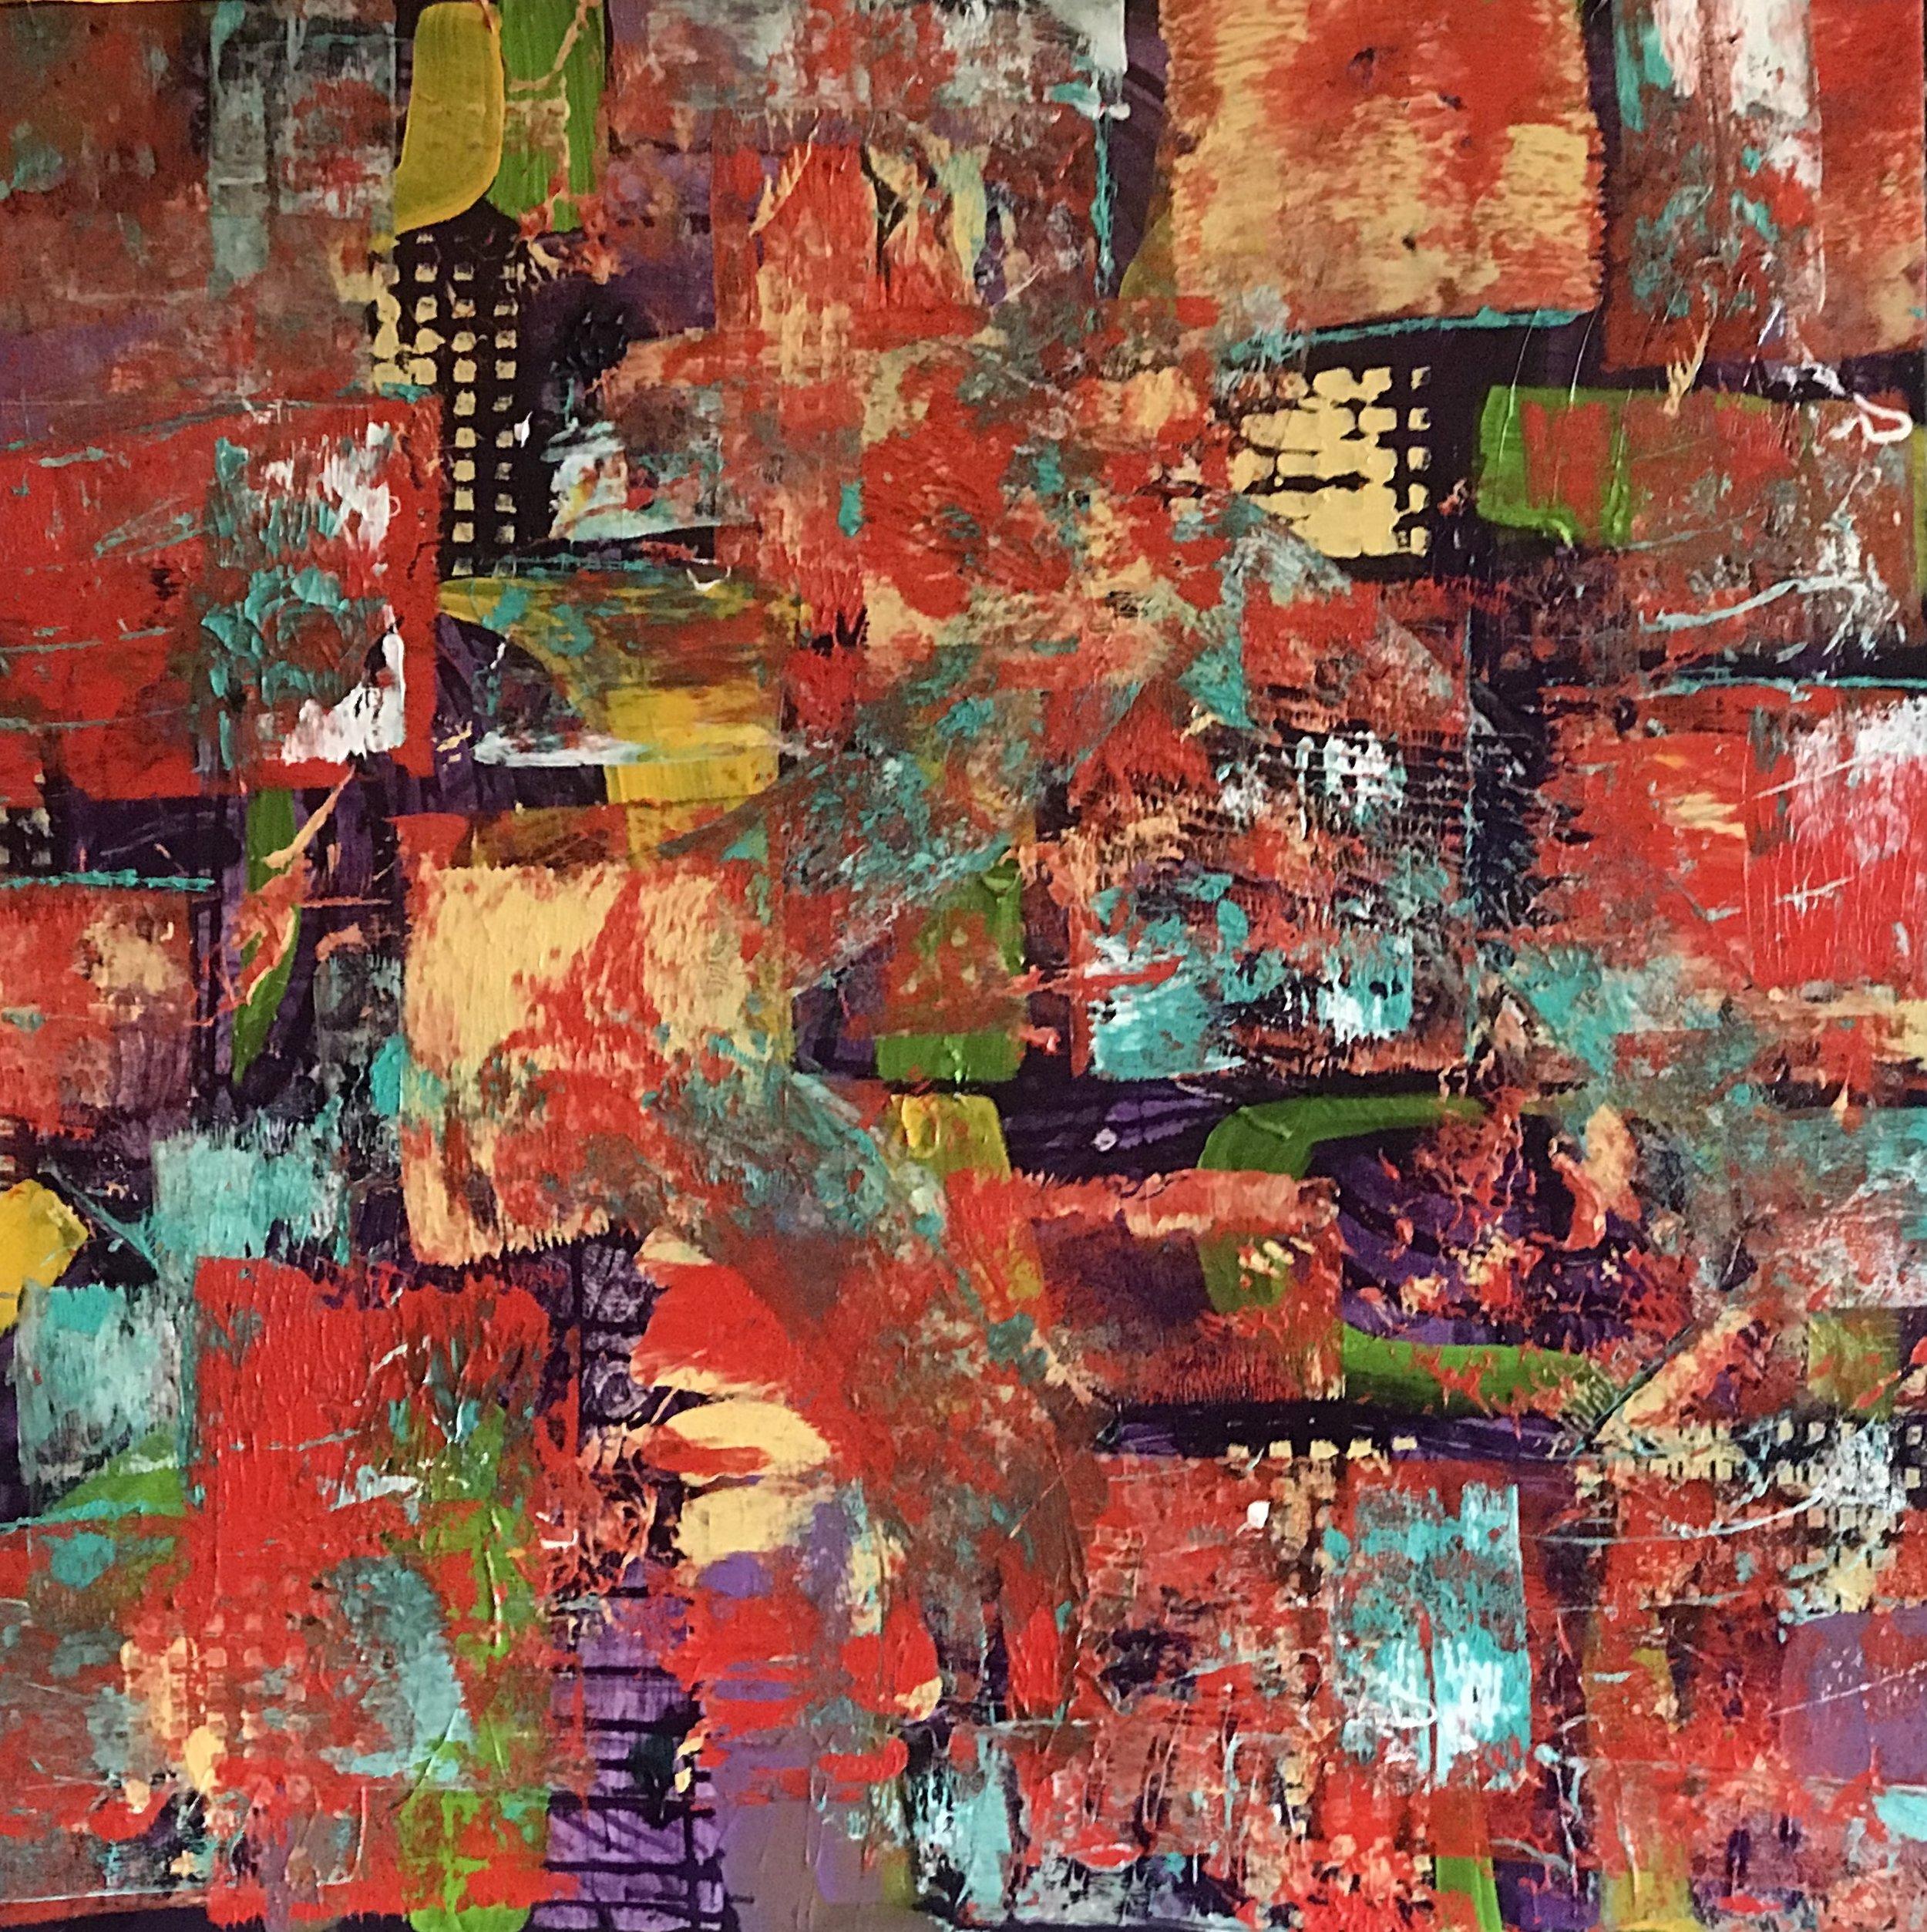 Sheila Cahill - _Hot Tomato_ - 30 x 30 - Acrylic on canvas - 2018 - $900 copy.jpeg